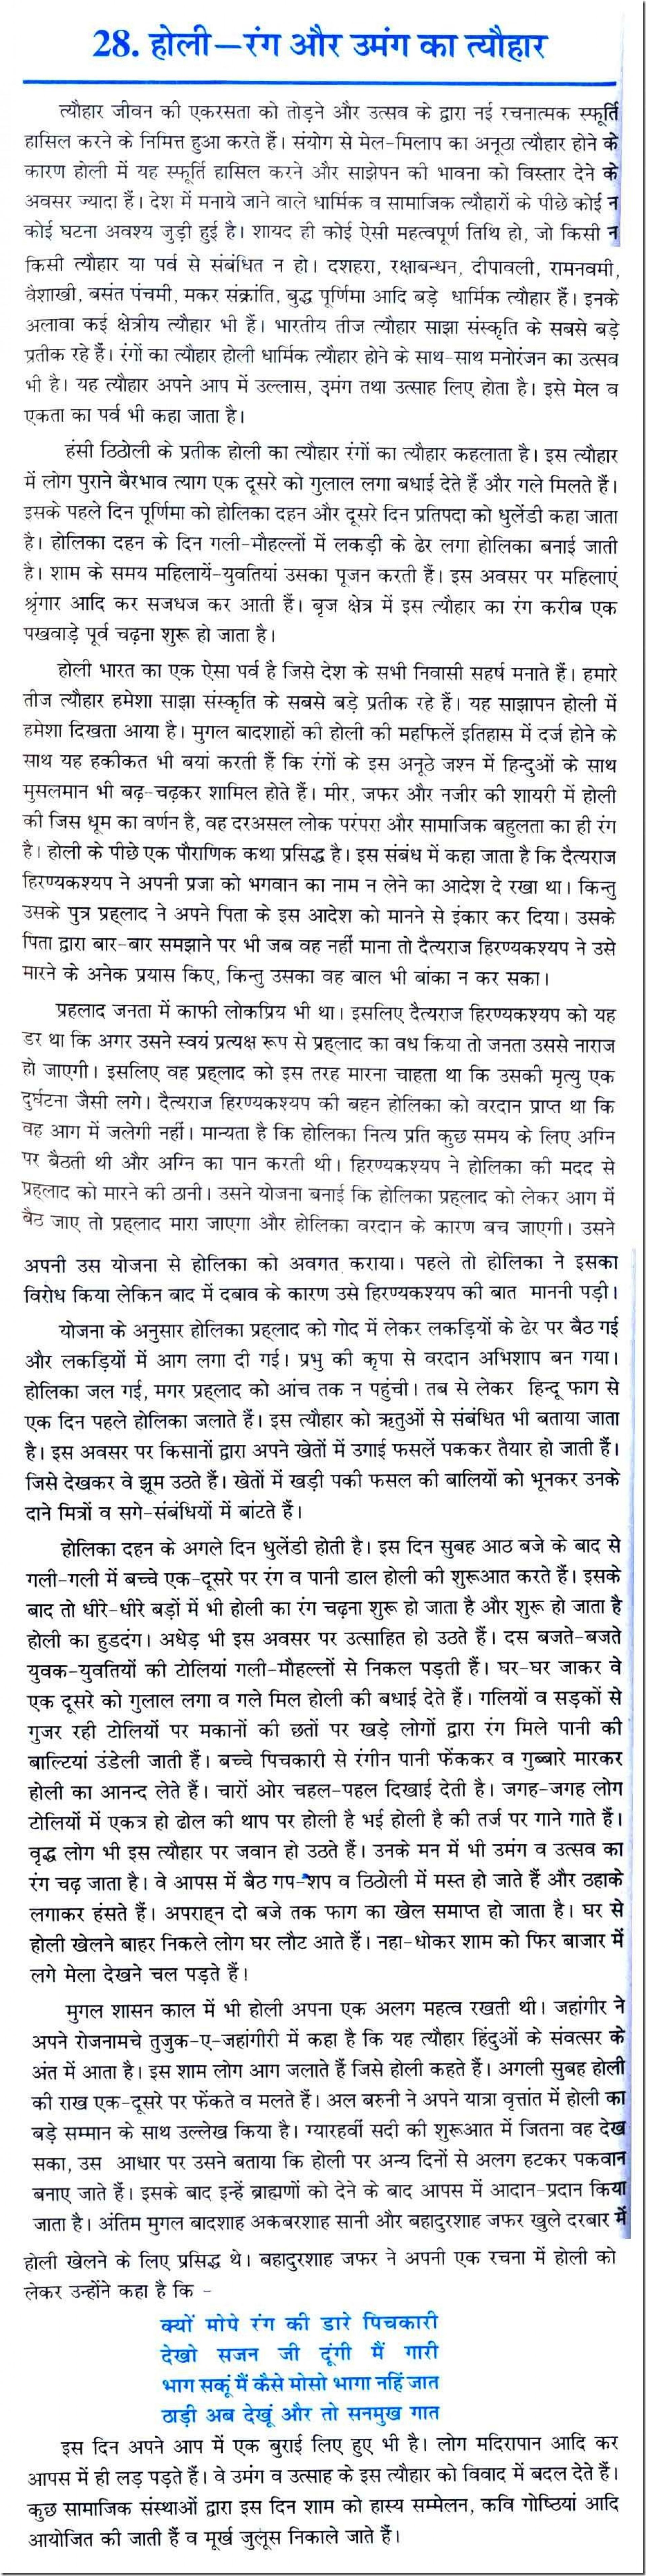 essay on gantantra diwas in sanskrit